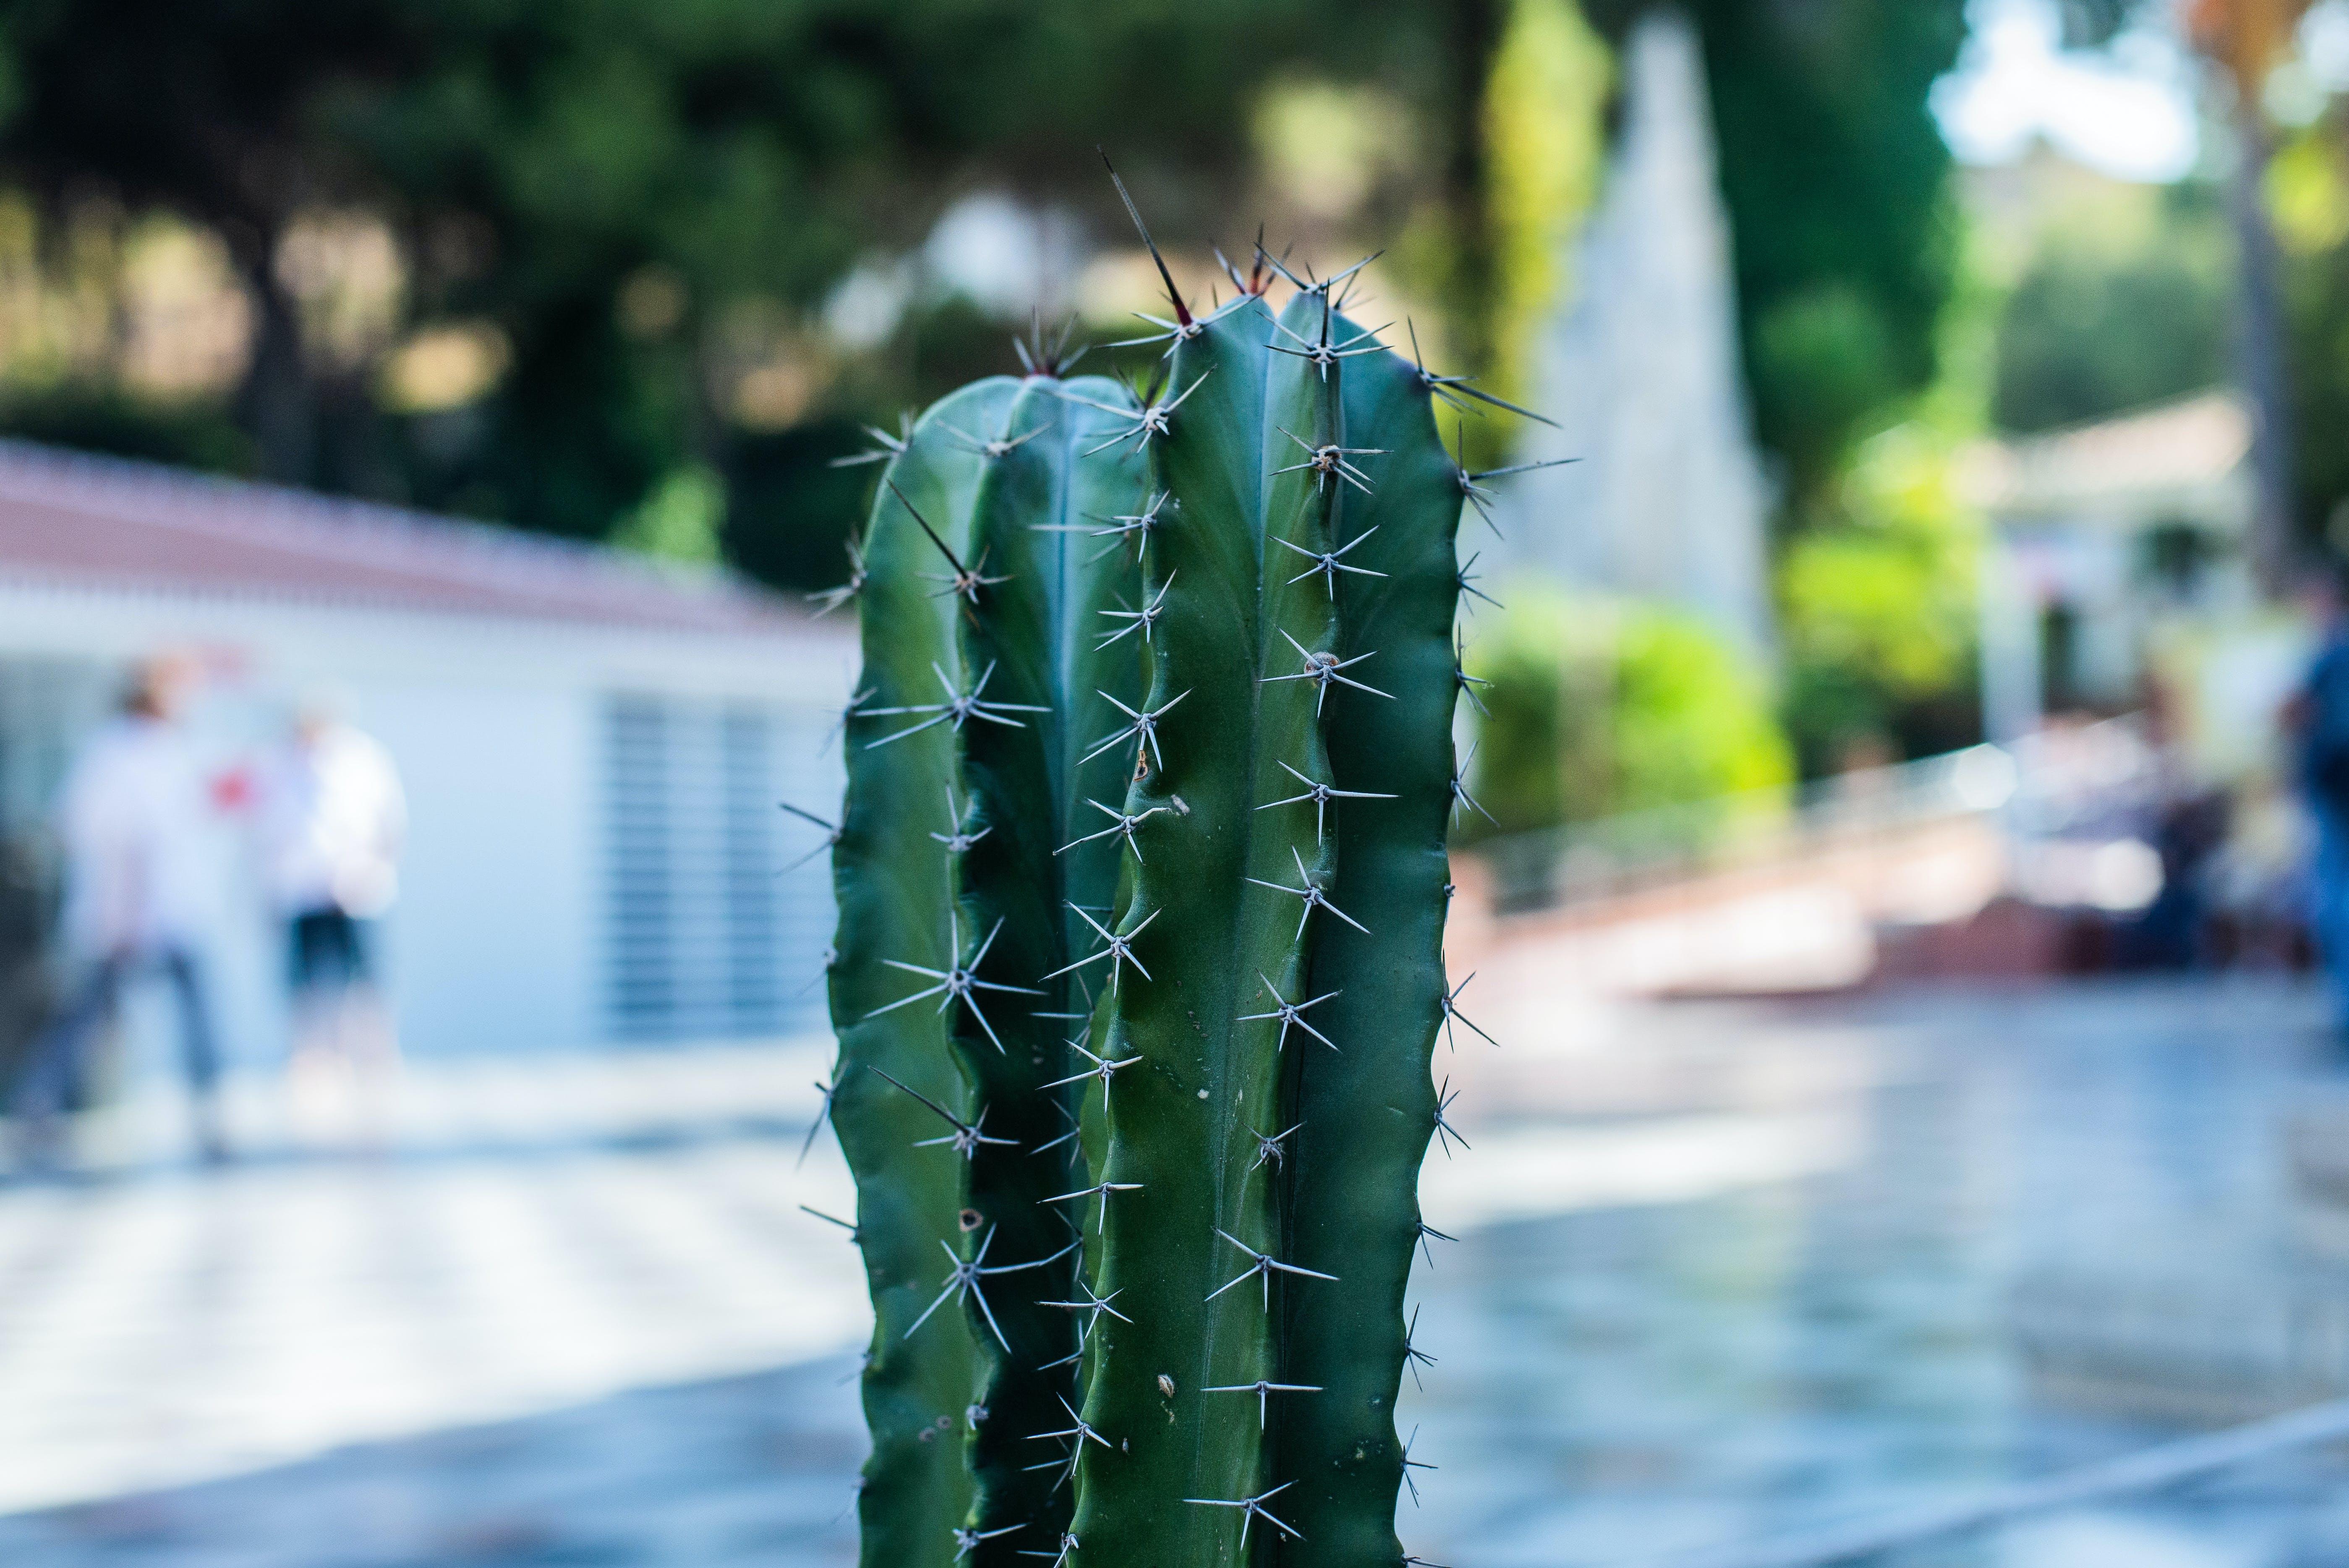 blurred background, cactus, nature